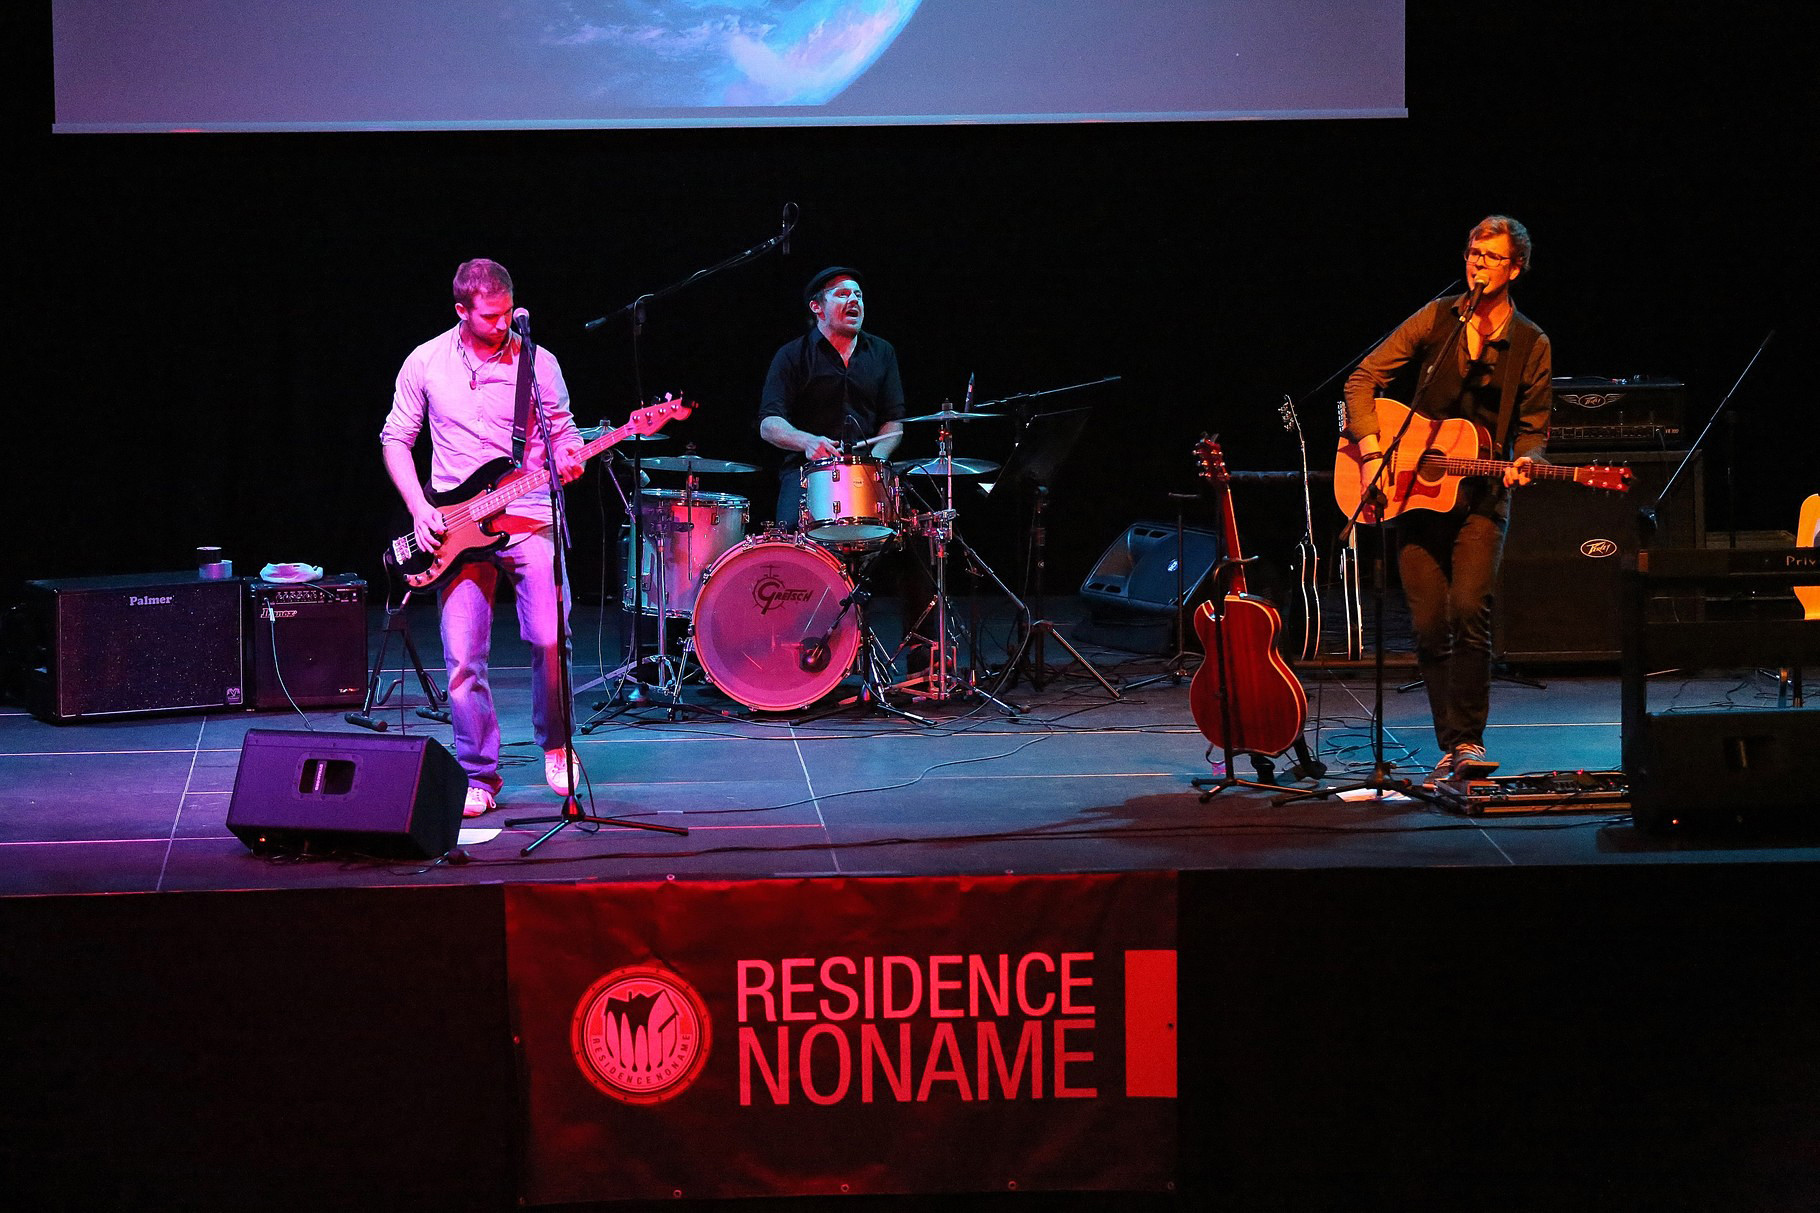 Residence NonAme